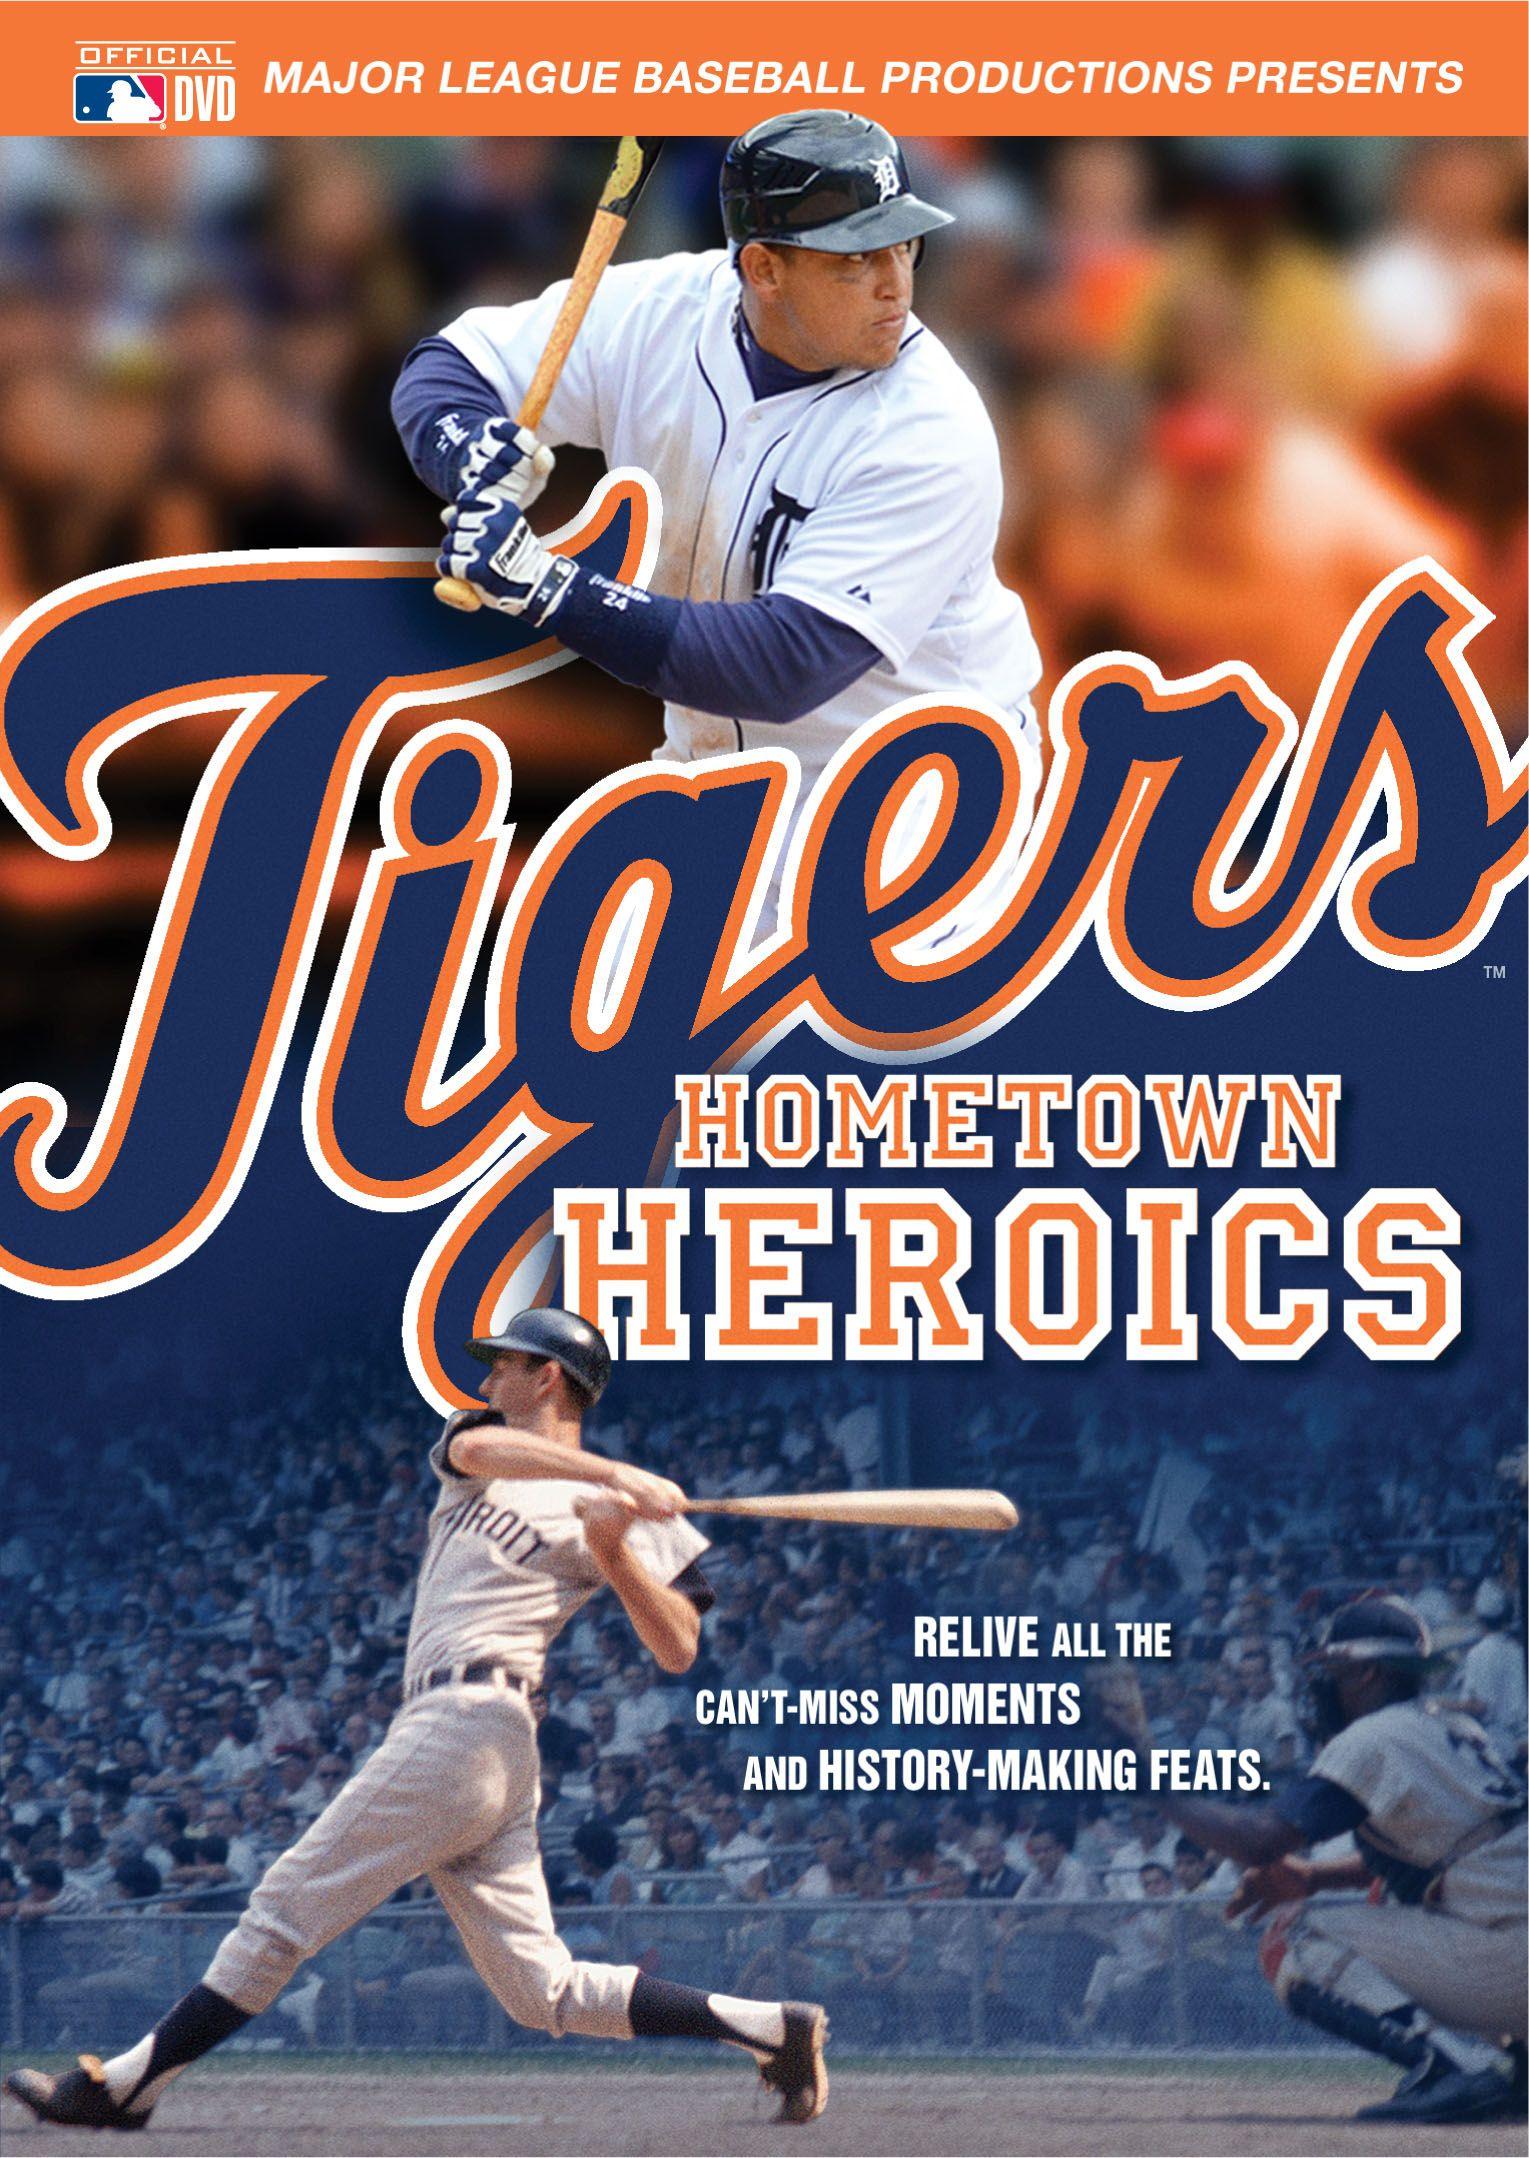 MLB: Tigers - Hometown Heroics